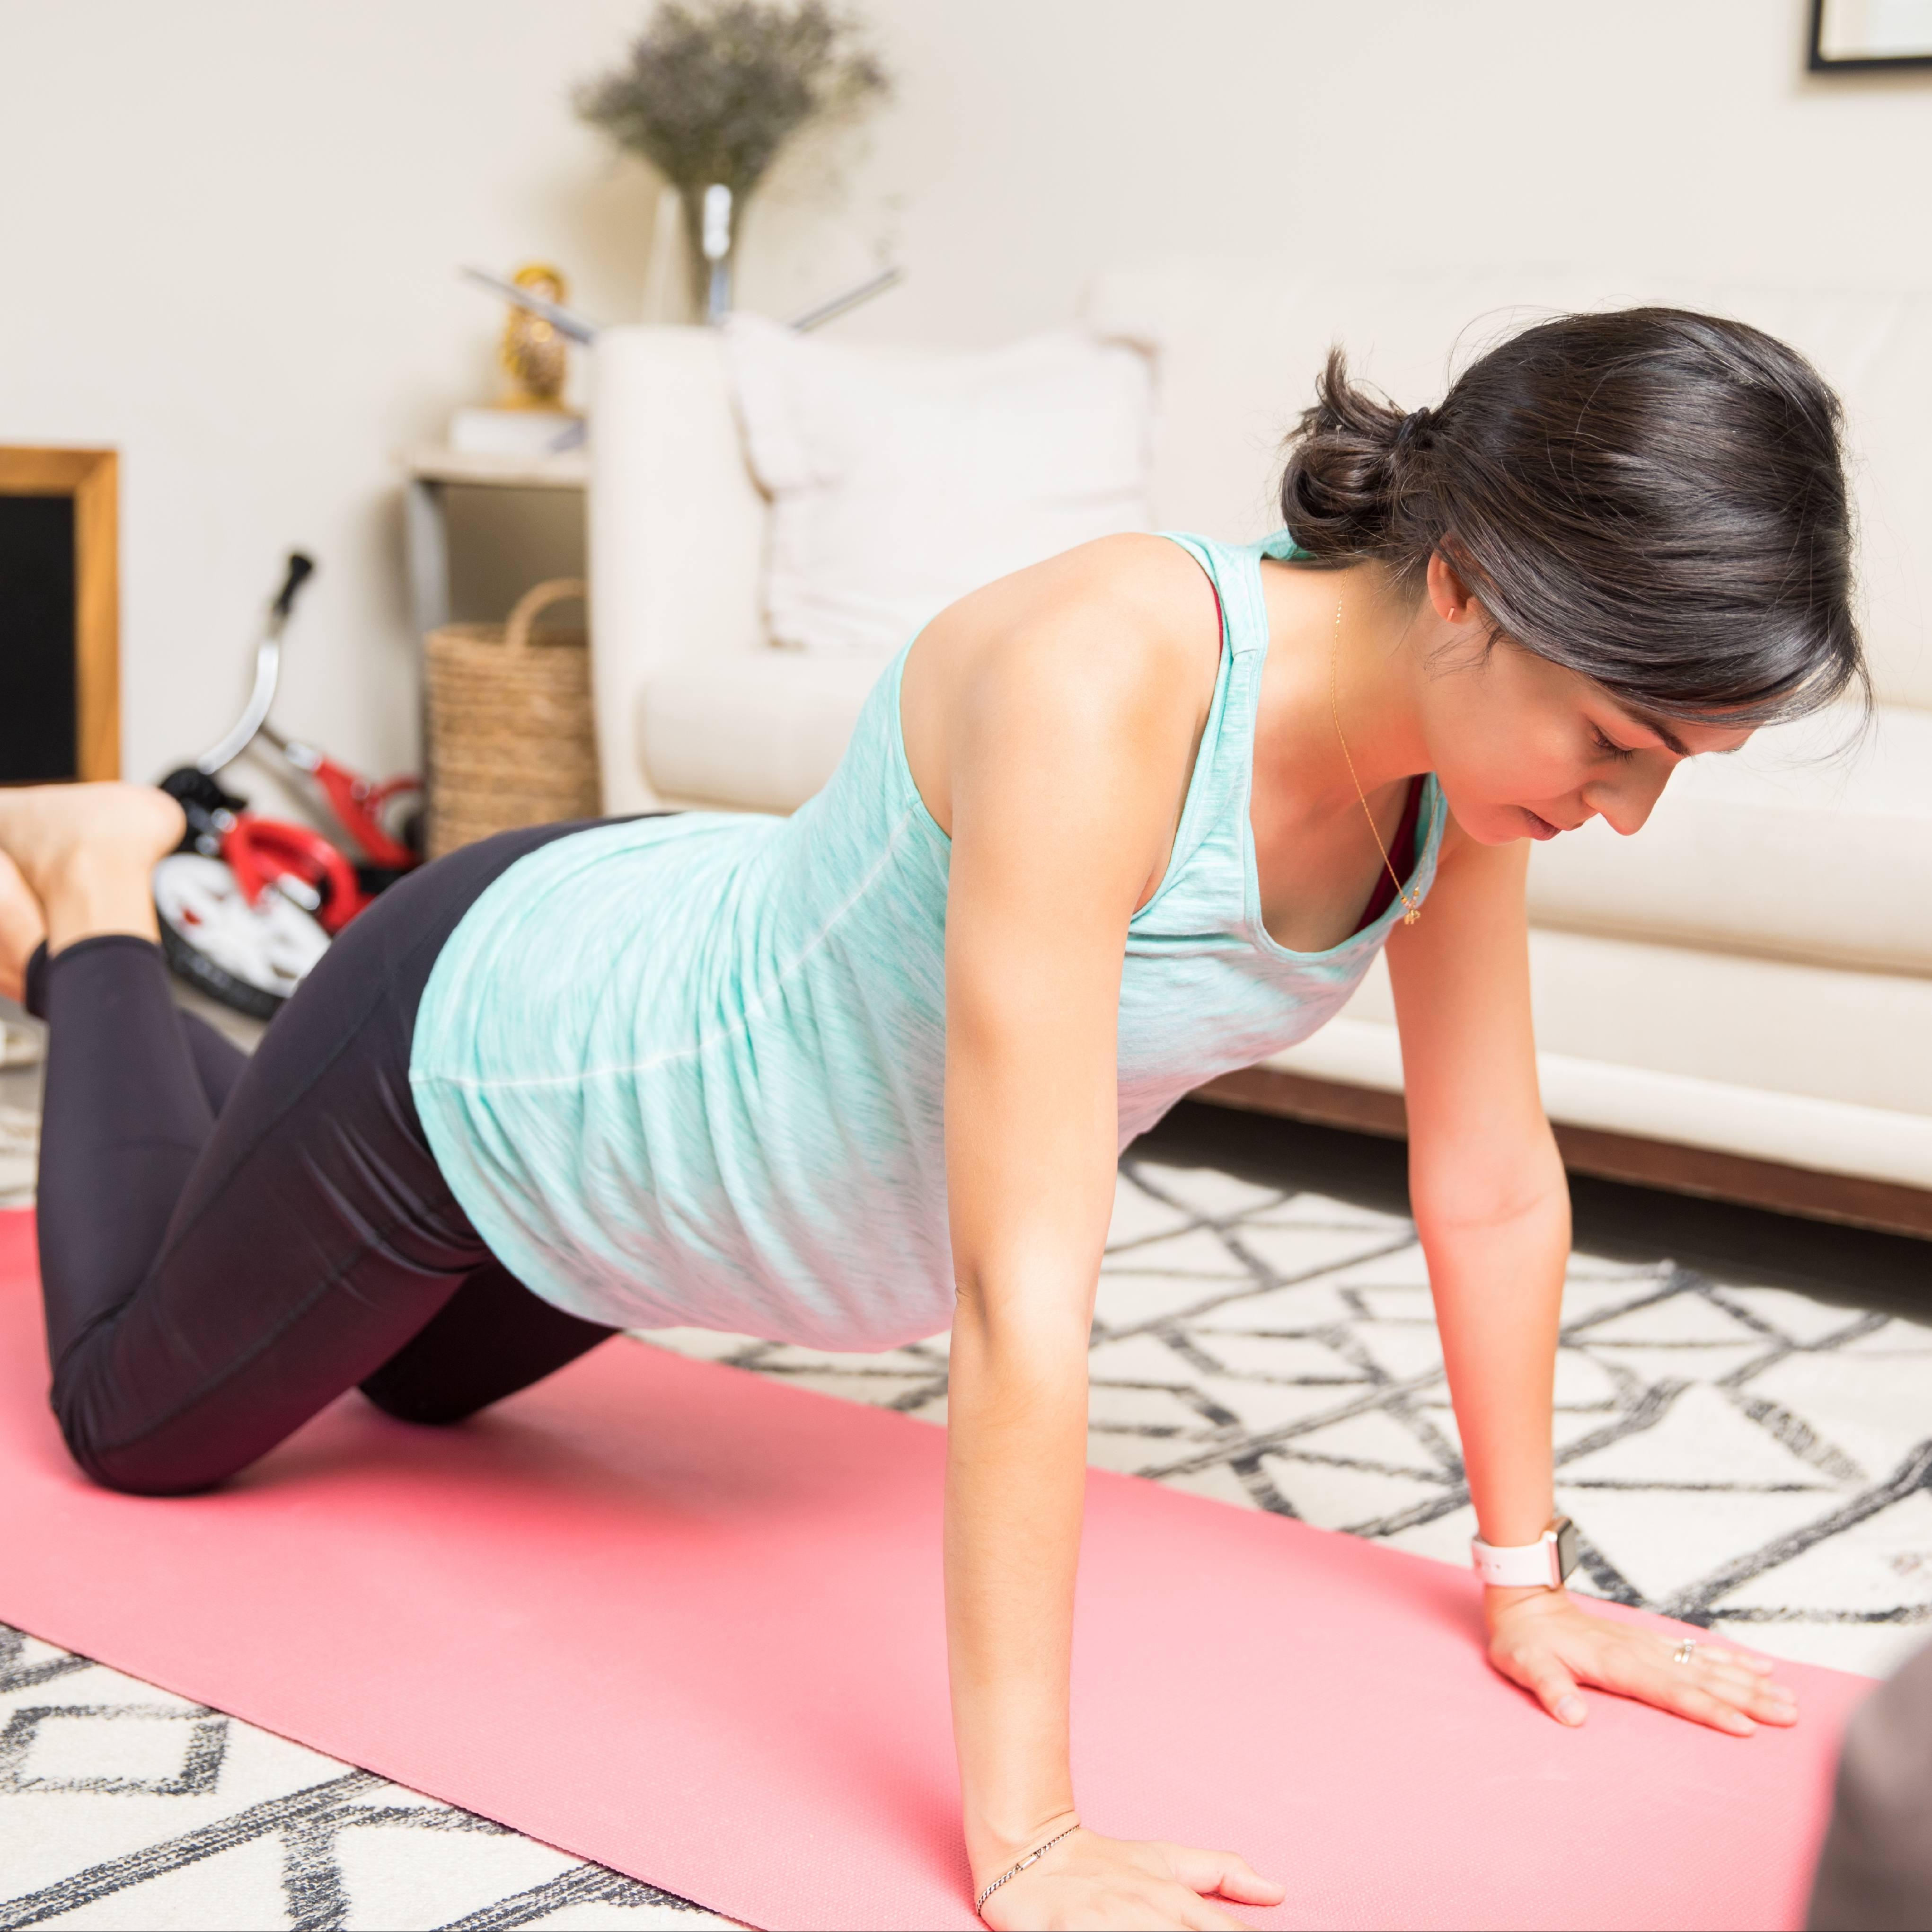 a pregnant Caucasian woman exercising on a yoga mat